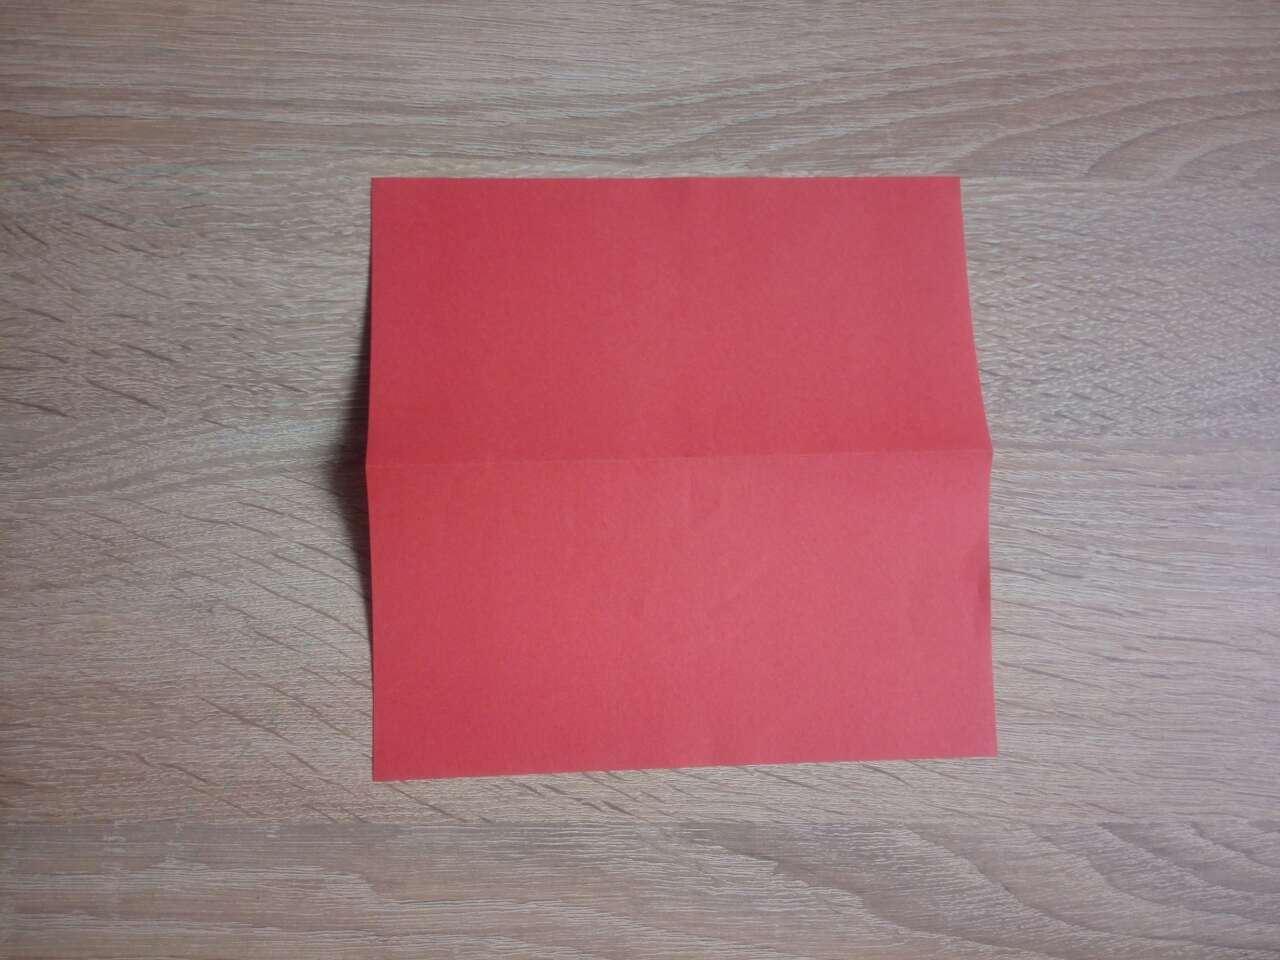 Take a piece of square sheet.